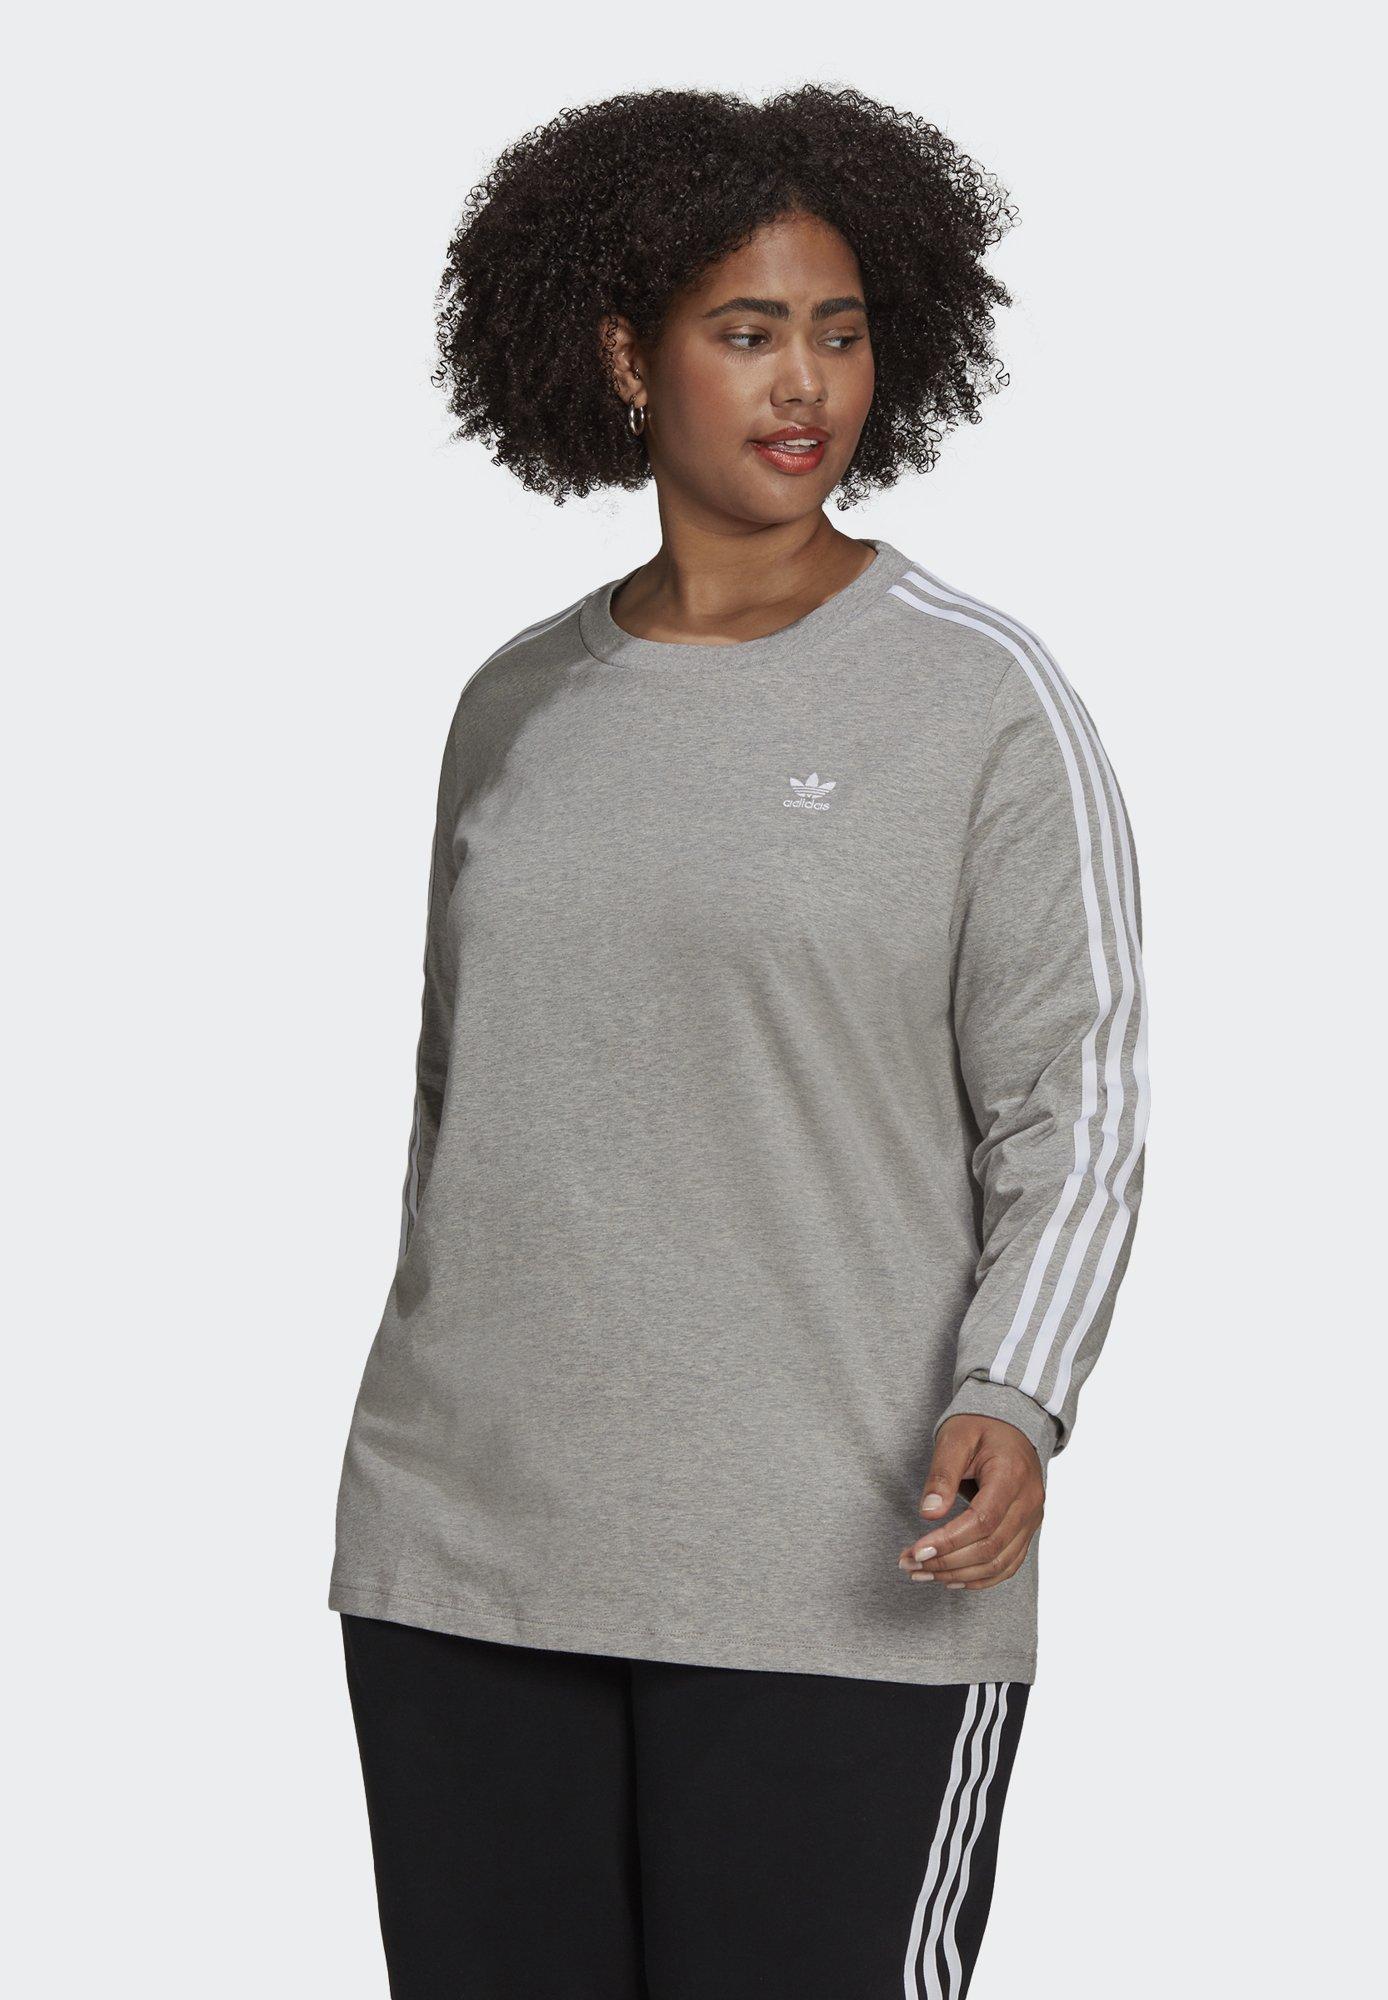 Damen 3-STRIPES ORIGINALS ADICOLOR LONG SLEEVE T-SHIRT - Langarmshirt